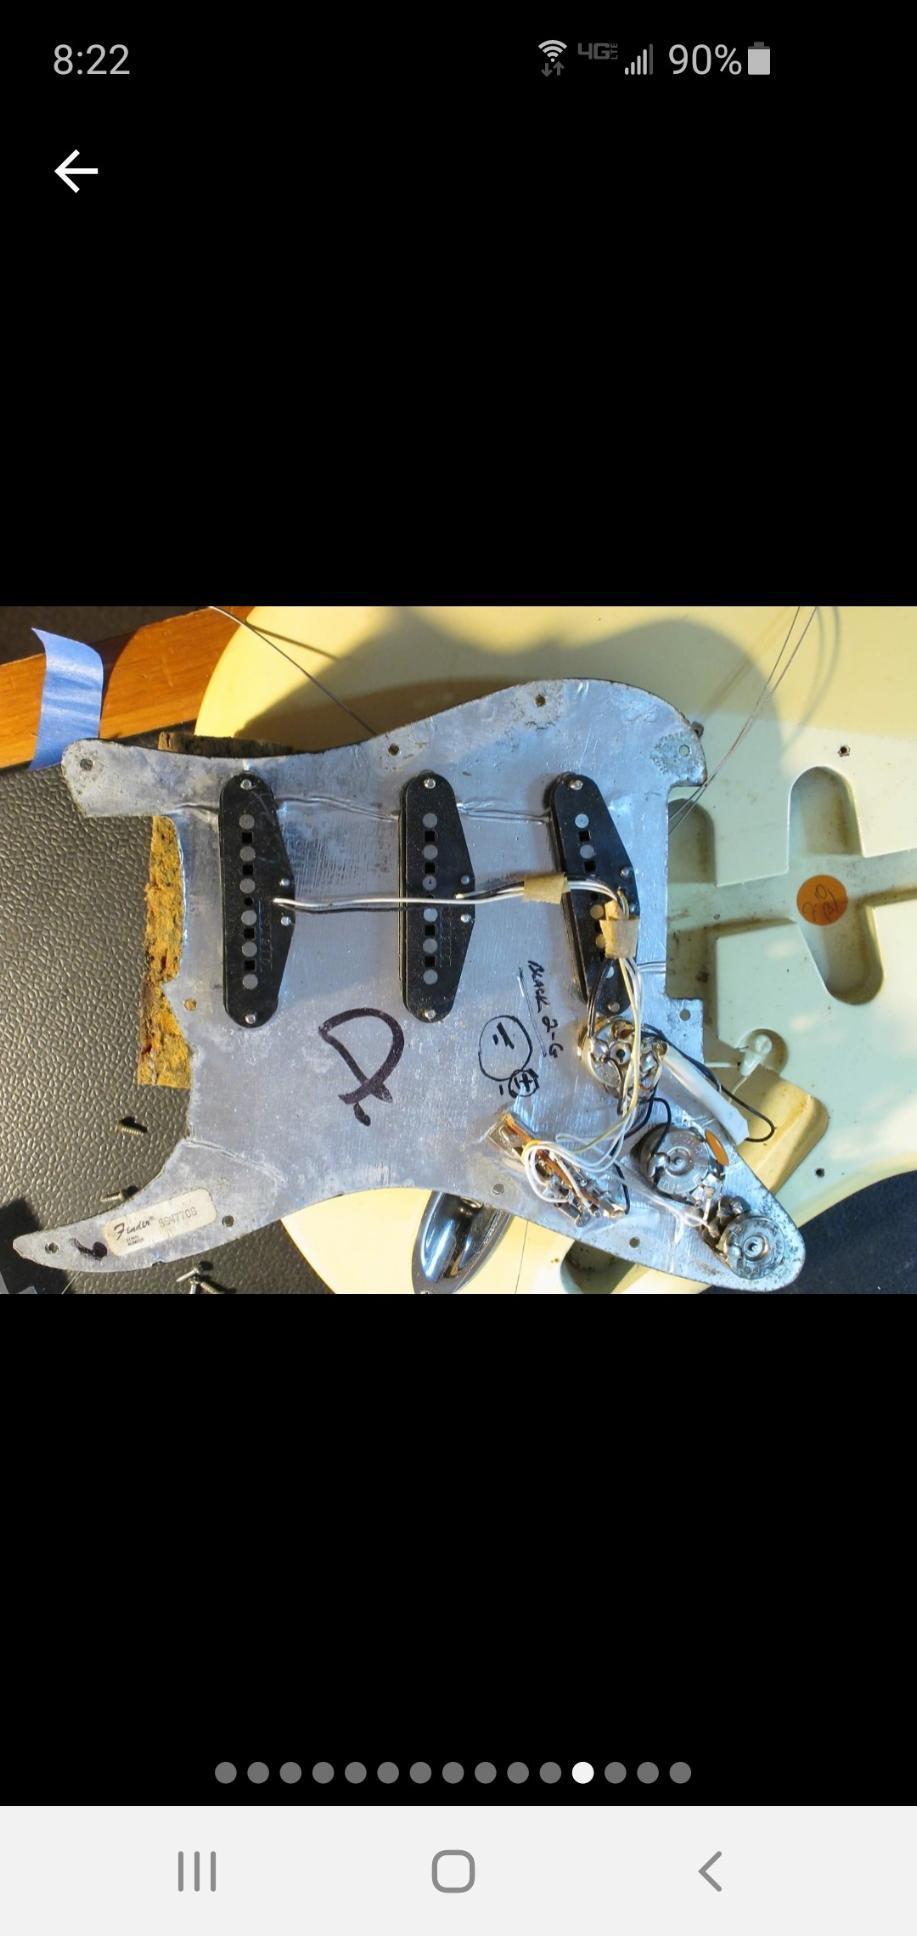 1979 Fender Stratocaster rosewood neck